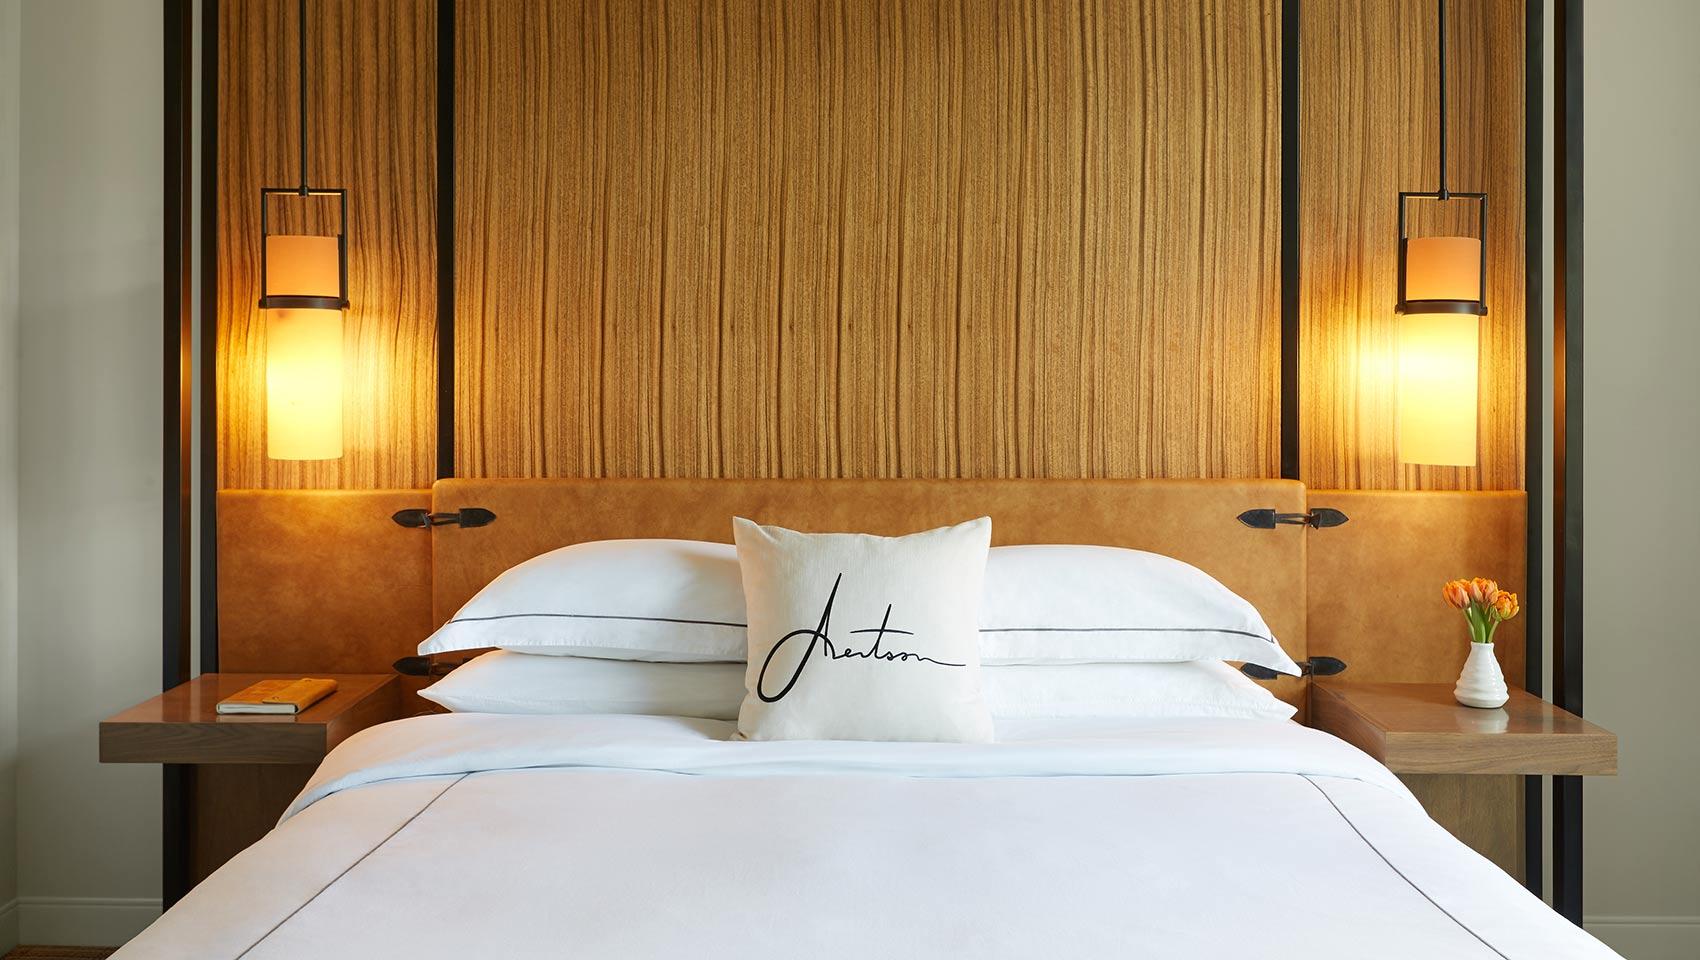 Aertson hotel room